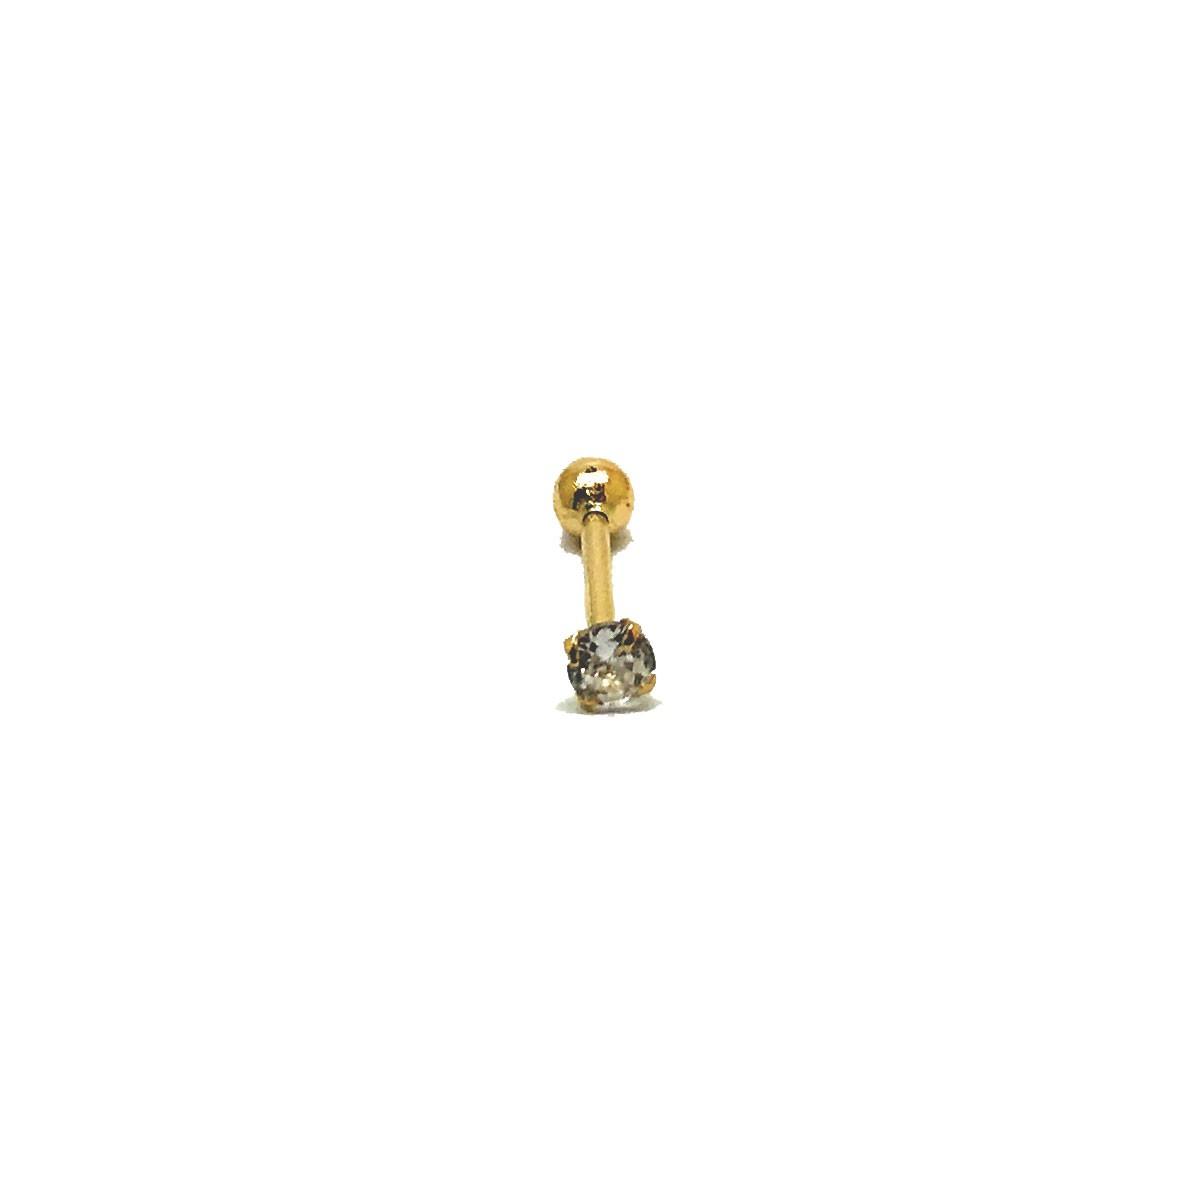 Piercing Ouro 18K Ponto De Luz Cartilagem Haste 8 Milimetros 25789 K035